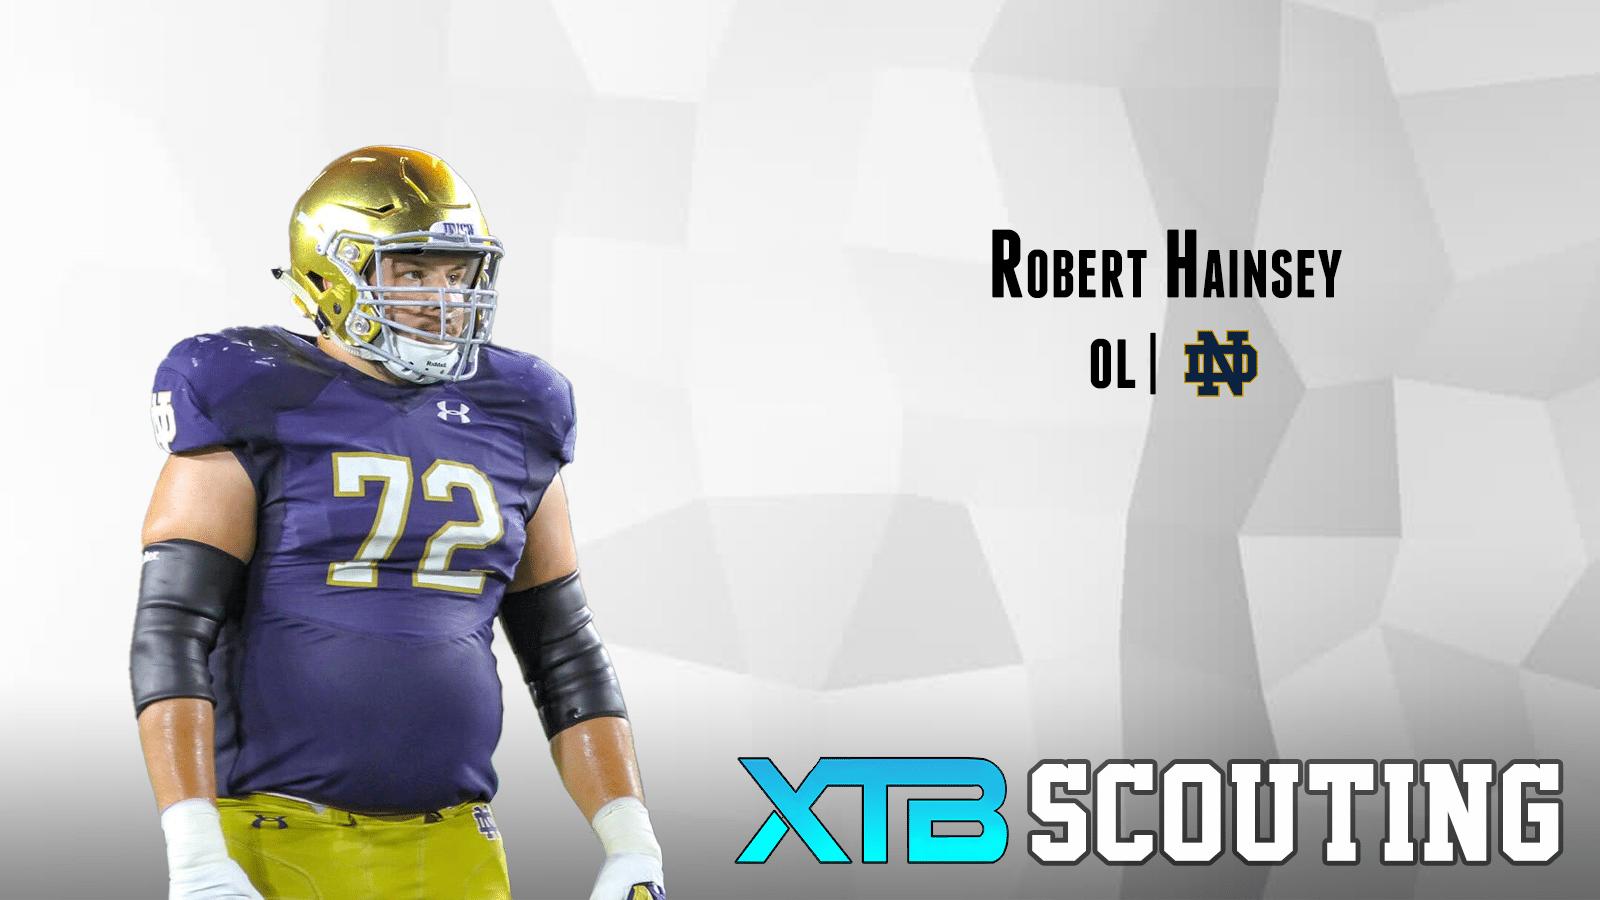 Robert Hainsey